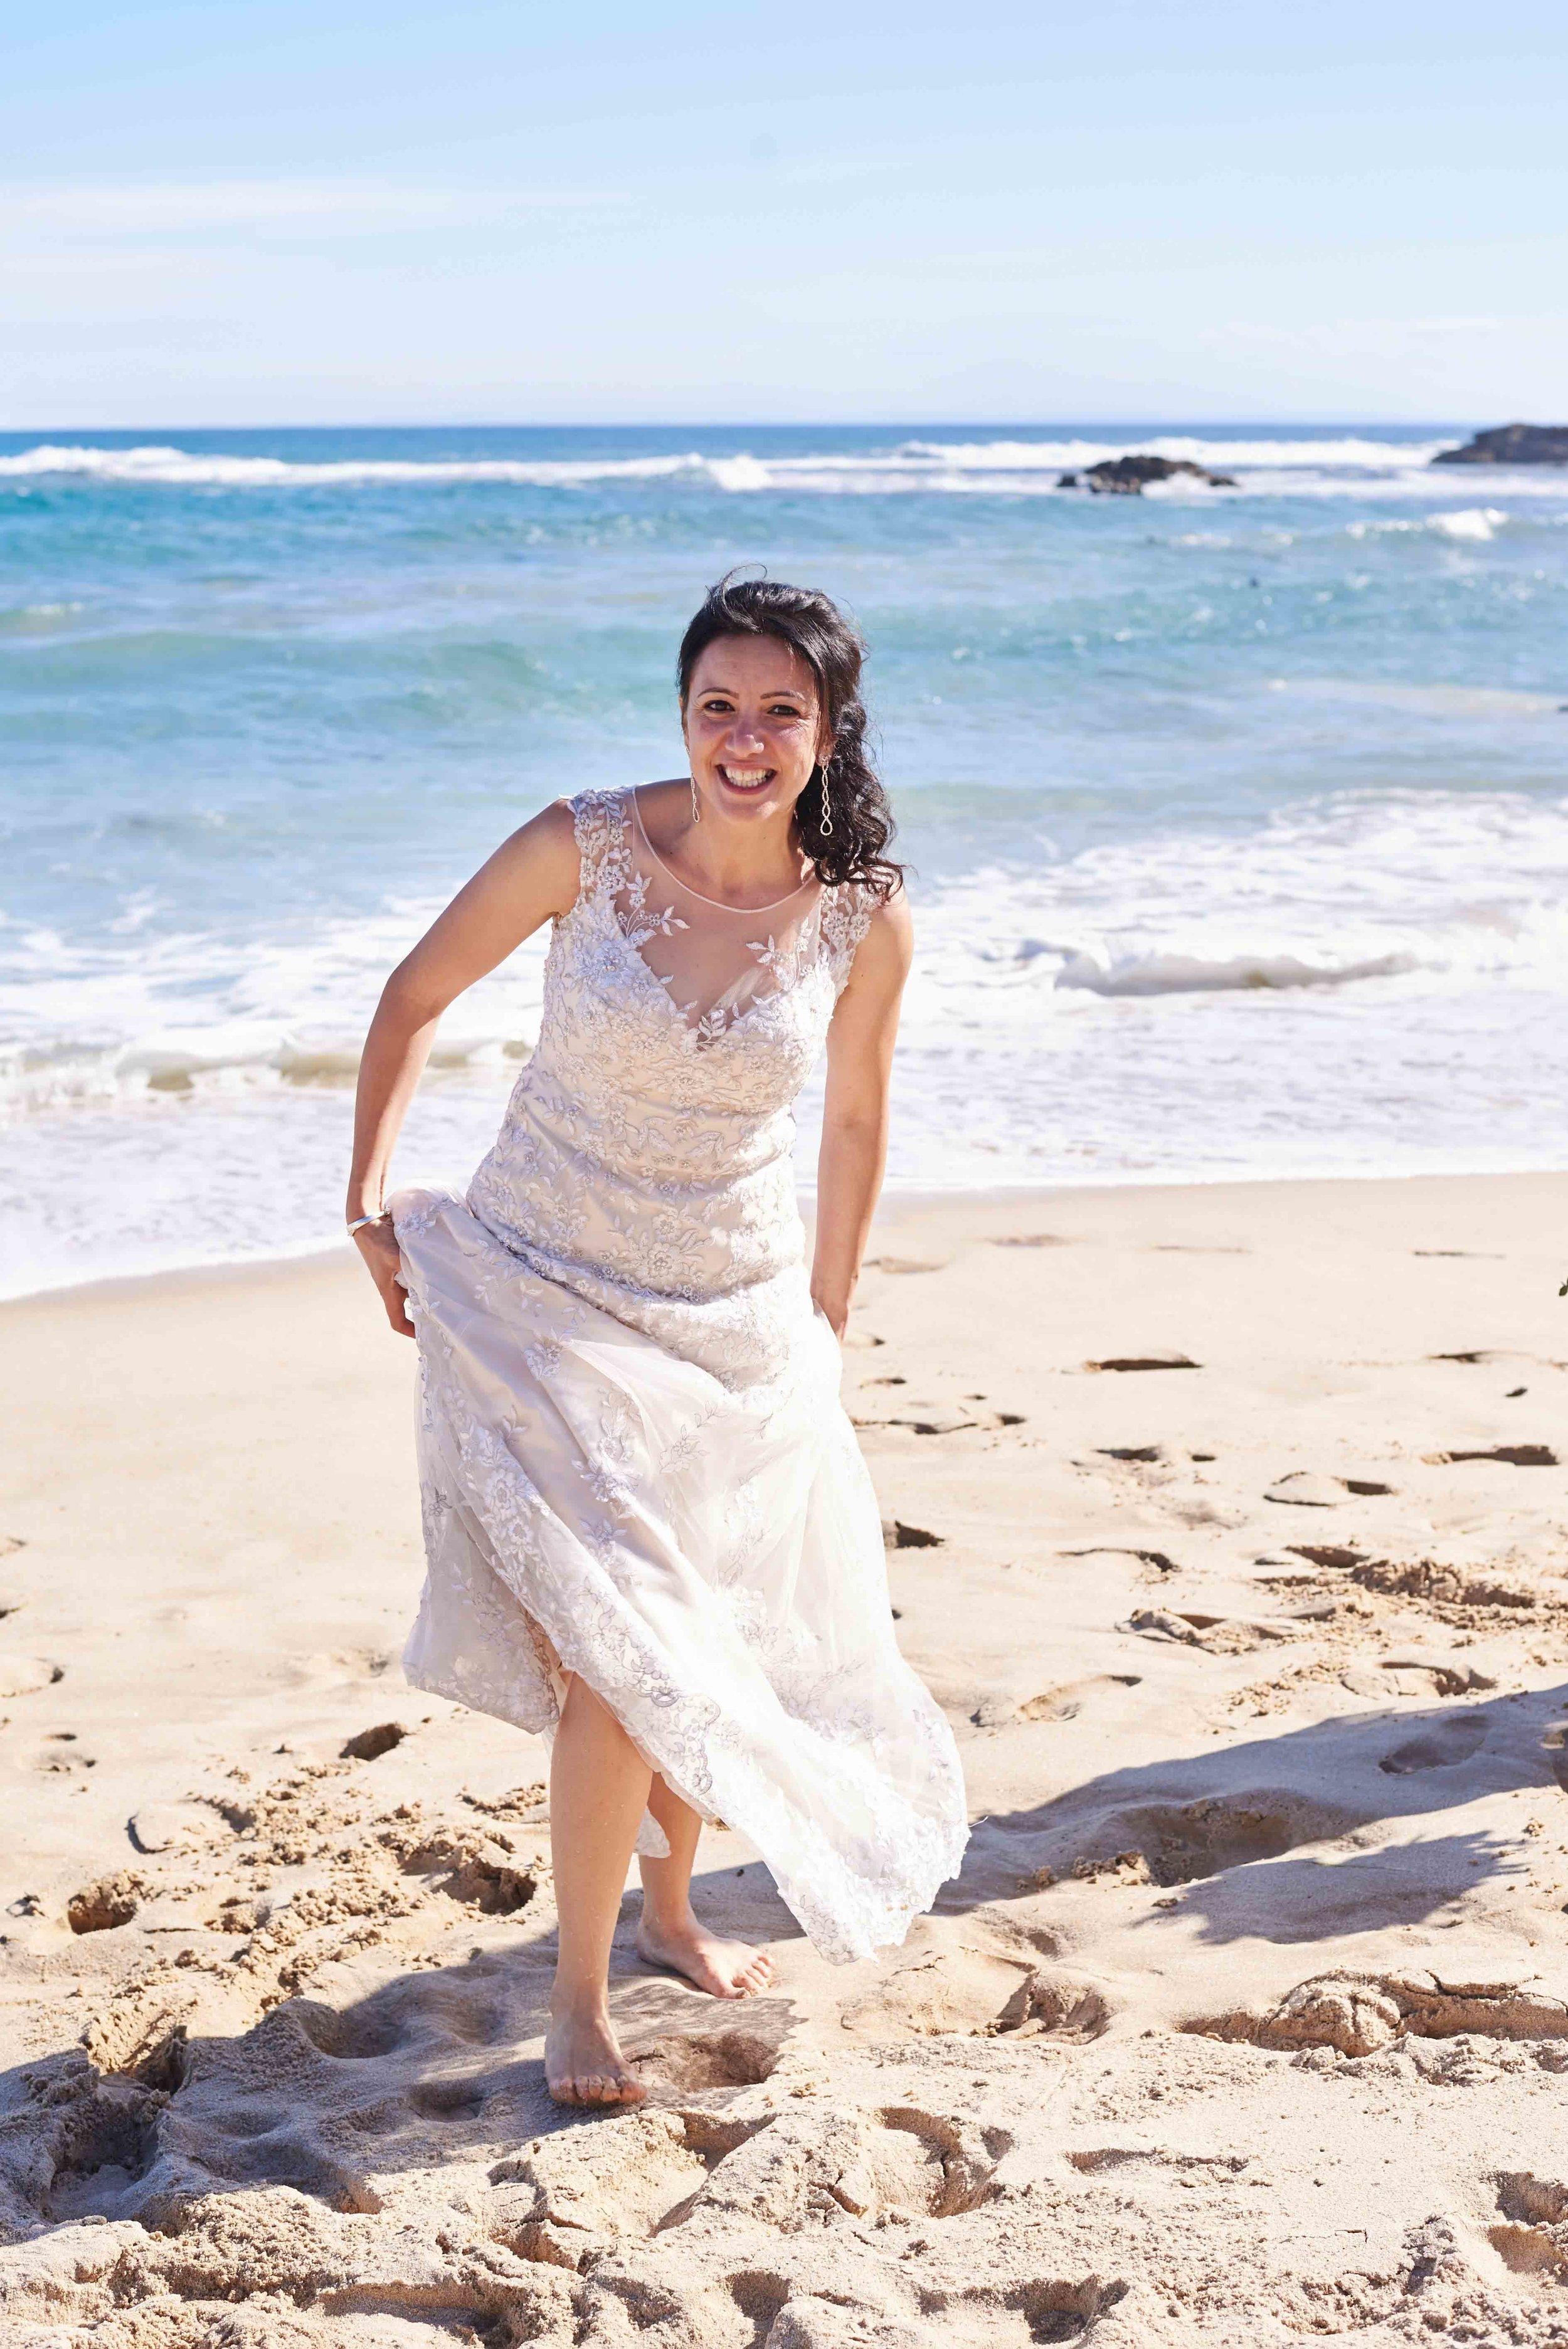 sorrento-wedding-photography-all-smiles-marissa-jade-photography-120.jpg